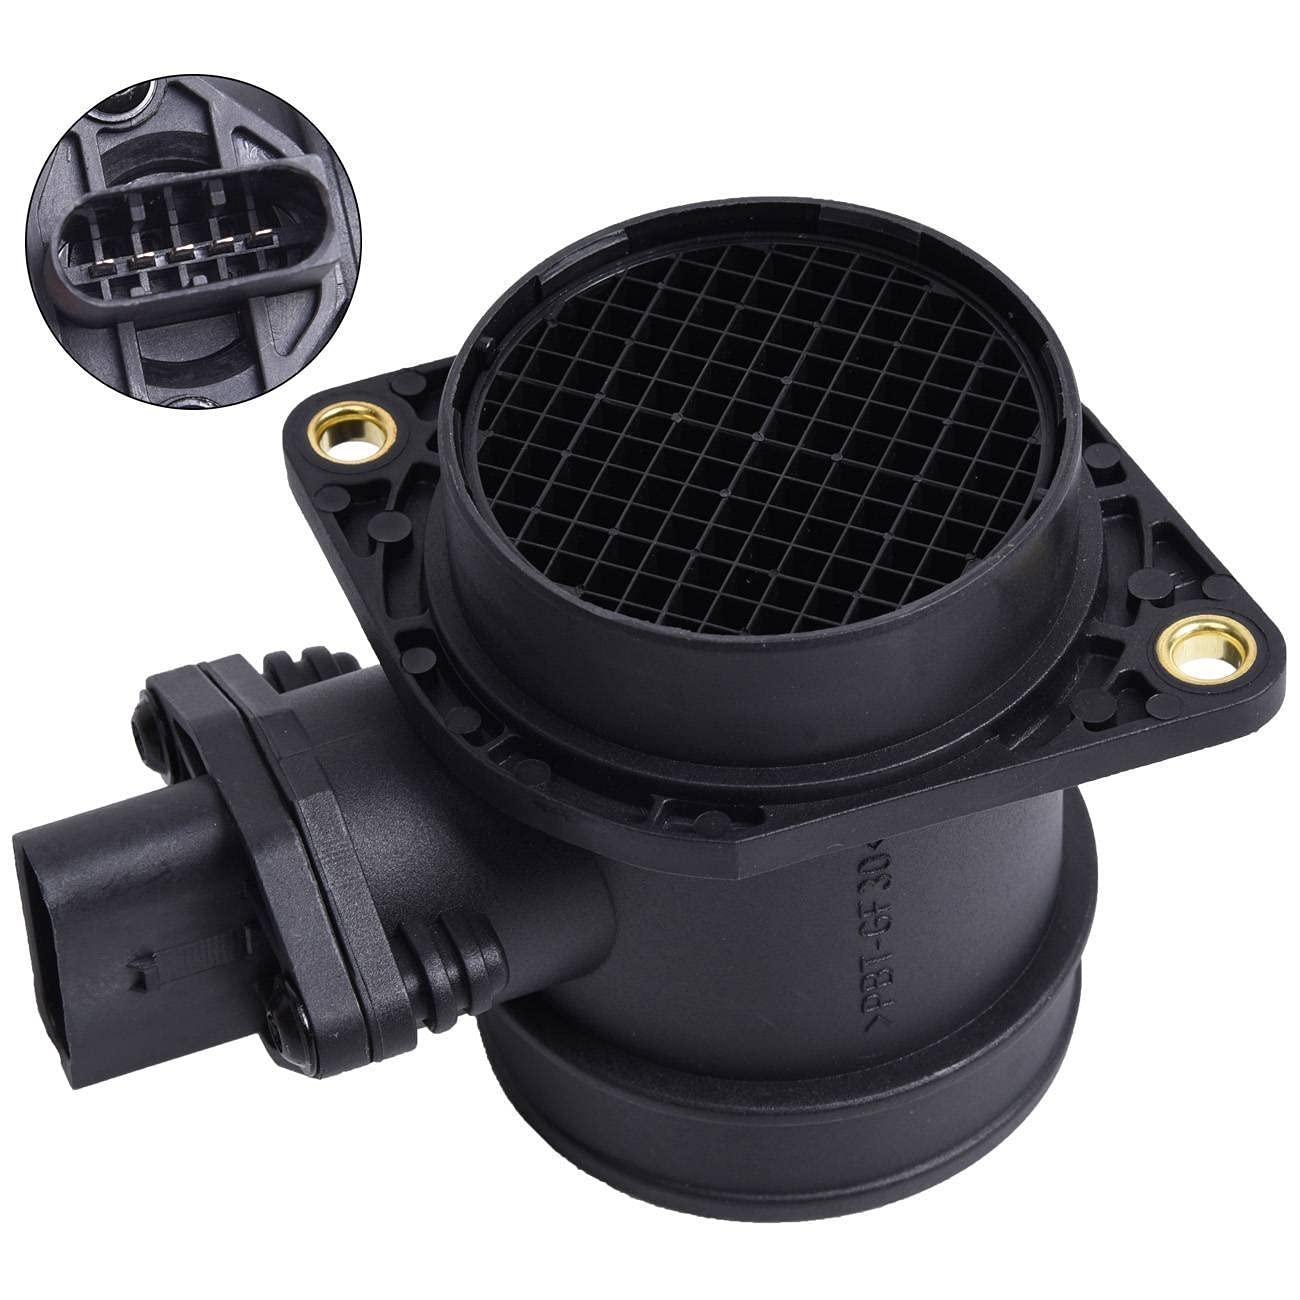 MAF Mass Air Flow Meter San Antonio Mall Sensor with Compatible mart Volkswagen A Golf